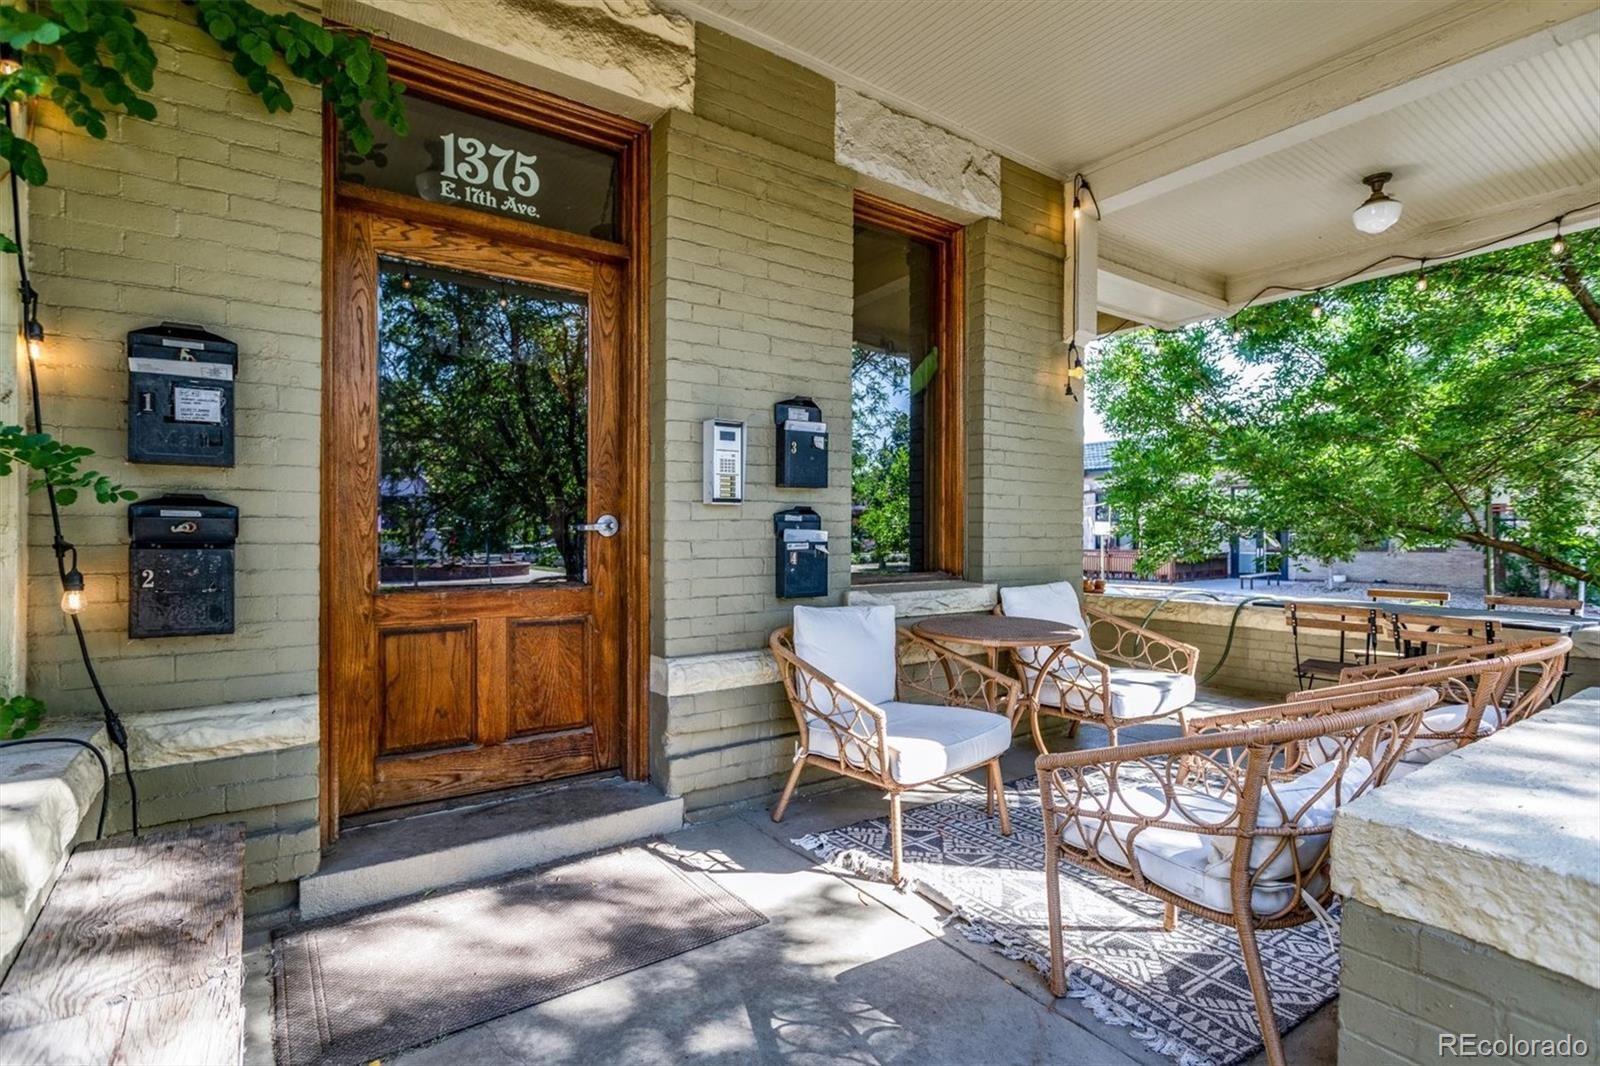 Photo of 1375 E 17th Avenue #2, Denver, CO 80218 (MLS # 6877200)